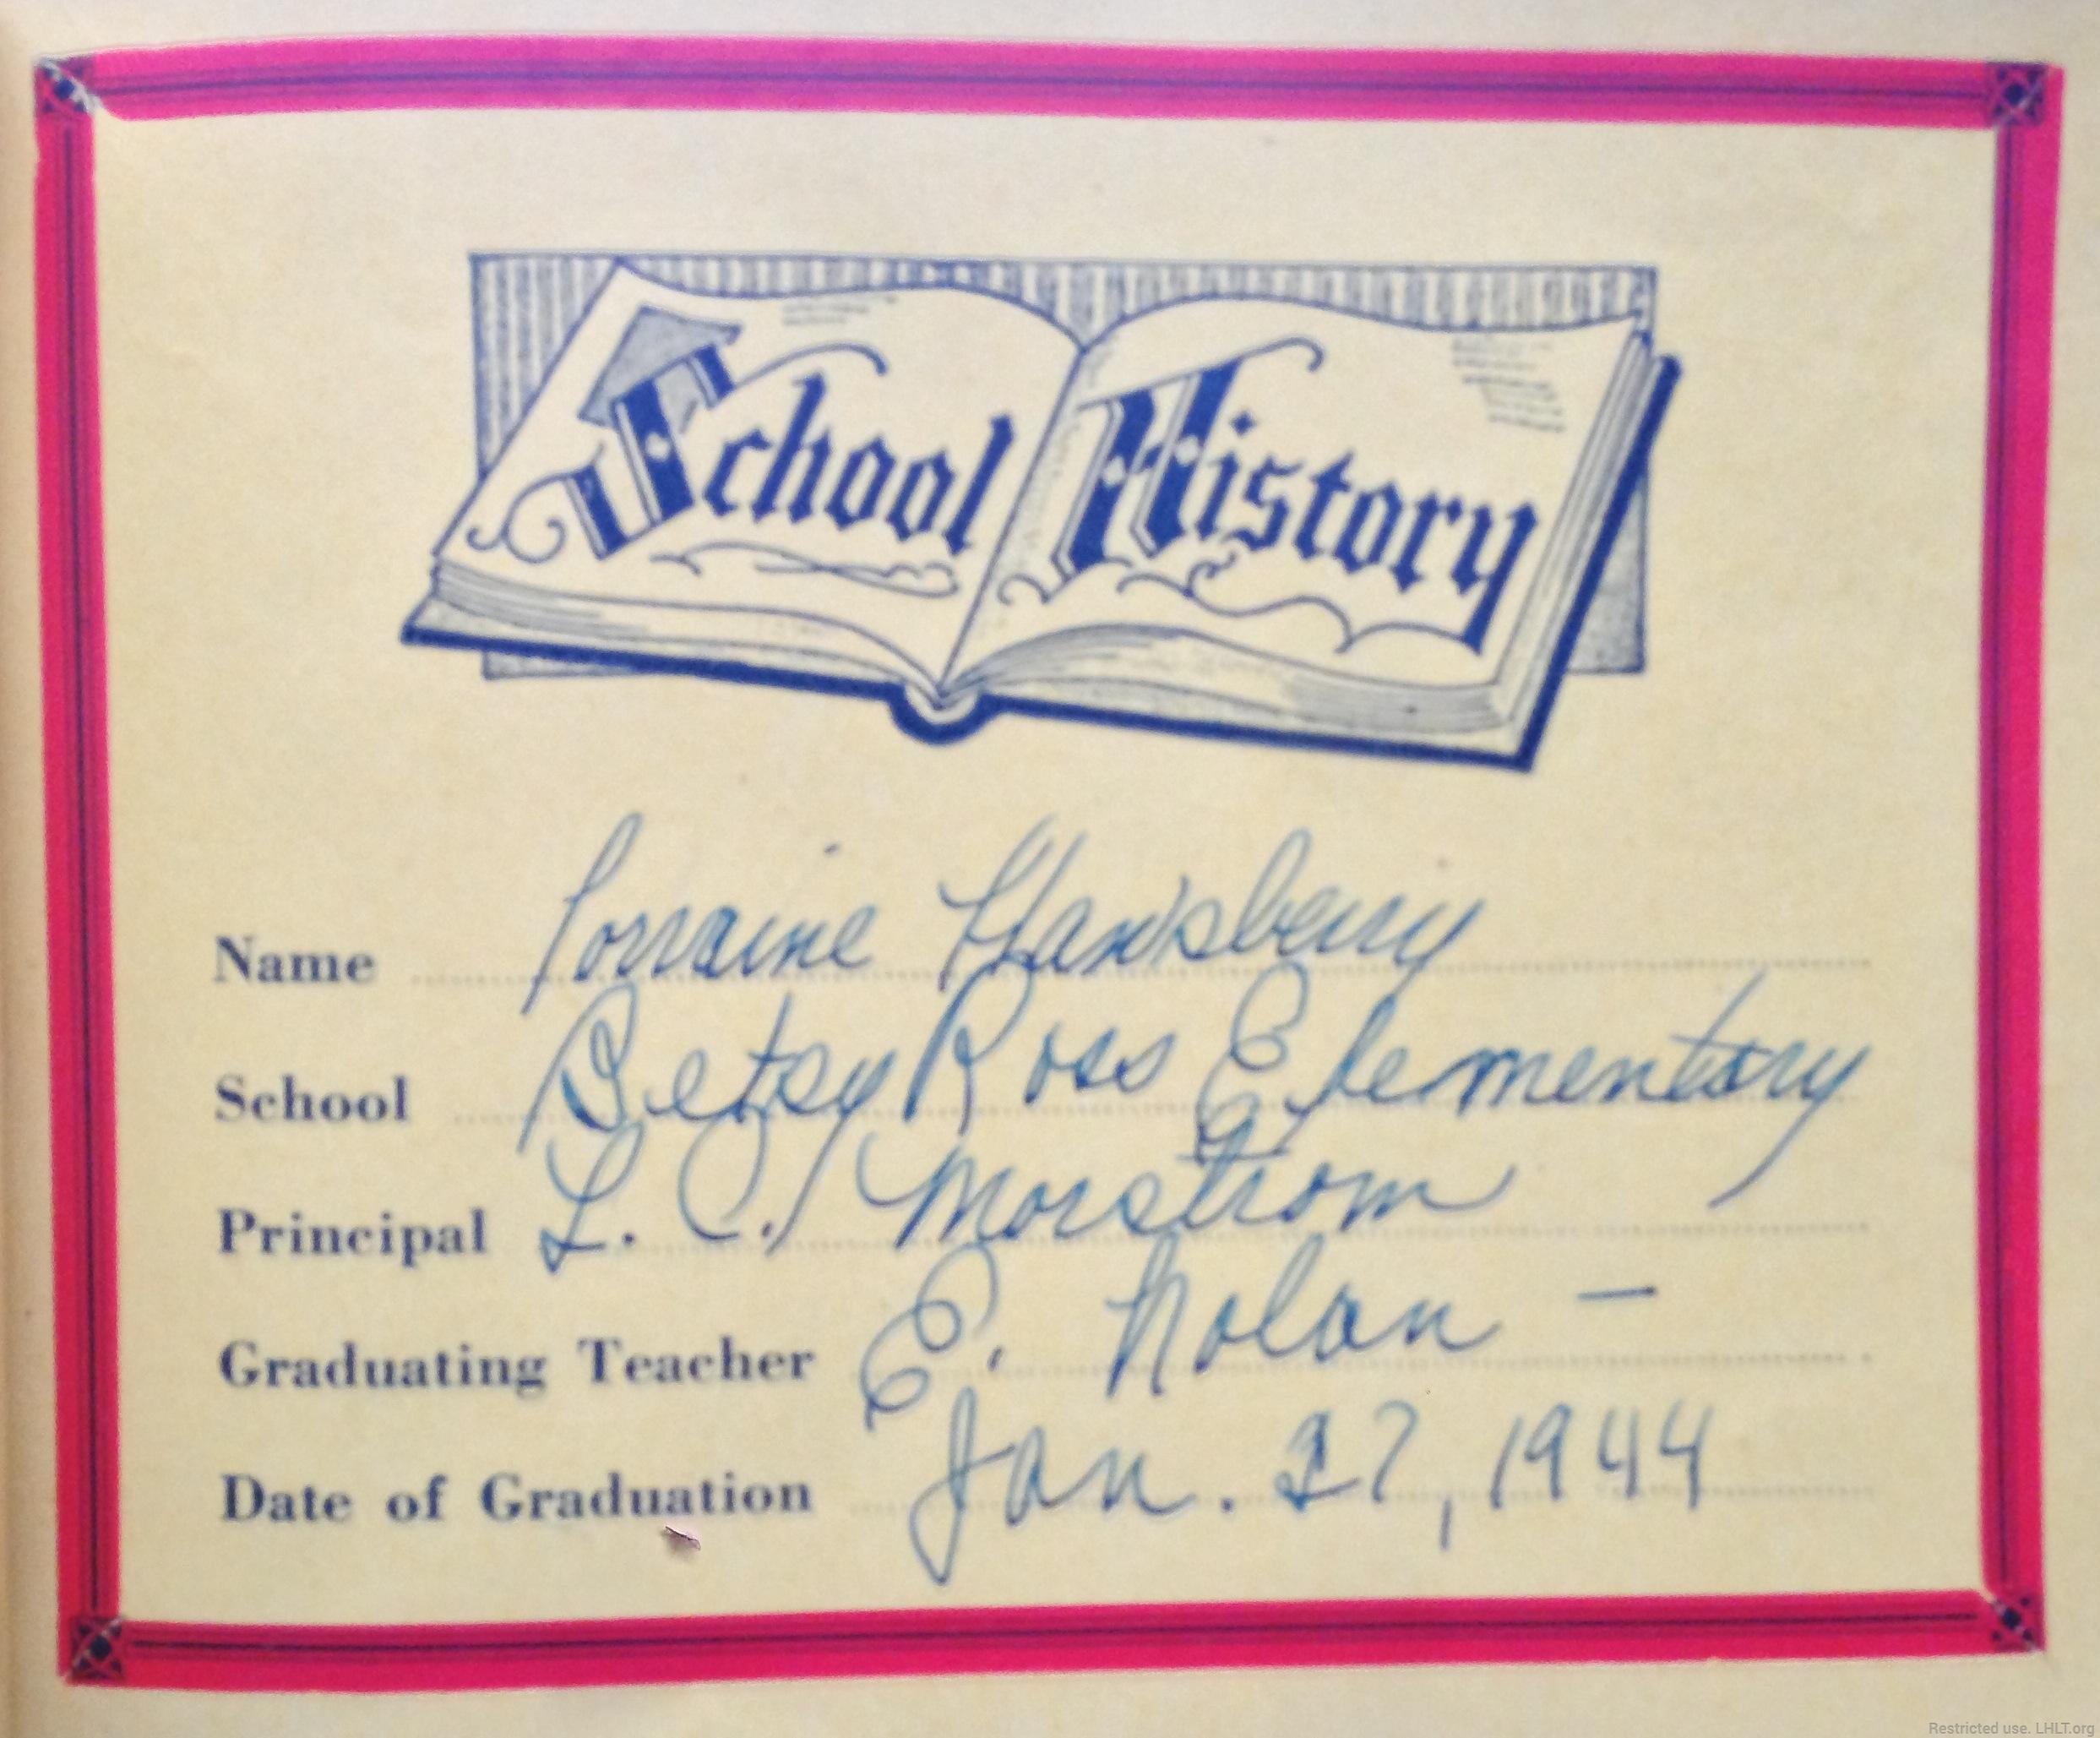 grade school autograph book lorraine hansberry literary trust